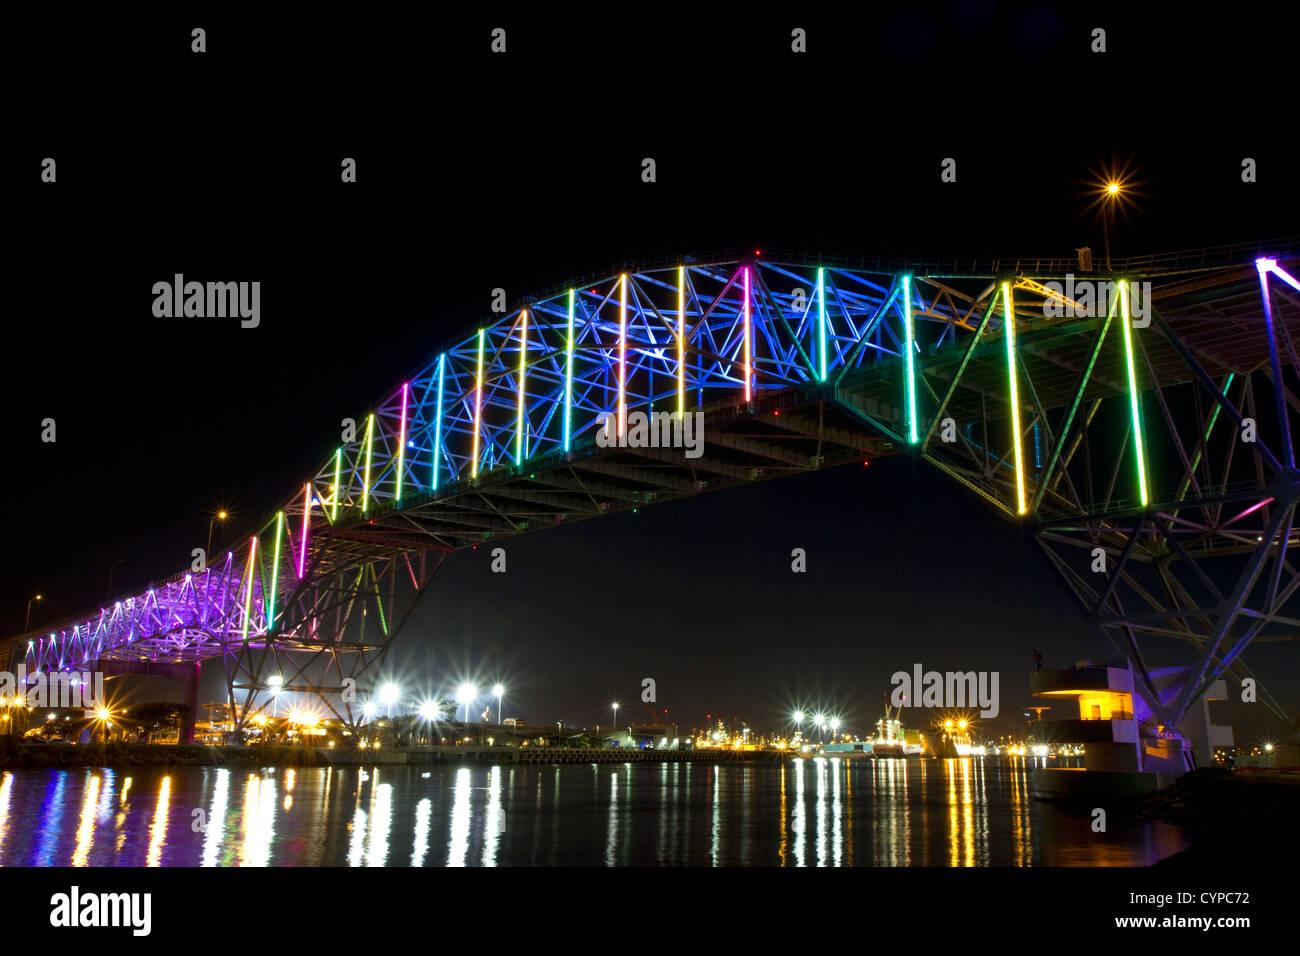 LED lights on the Corpus Christi Harbor Bridge located in Corpus Christi, Texas, USA. - Stock Image